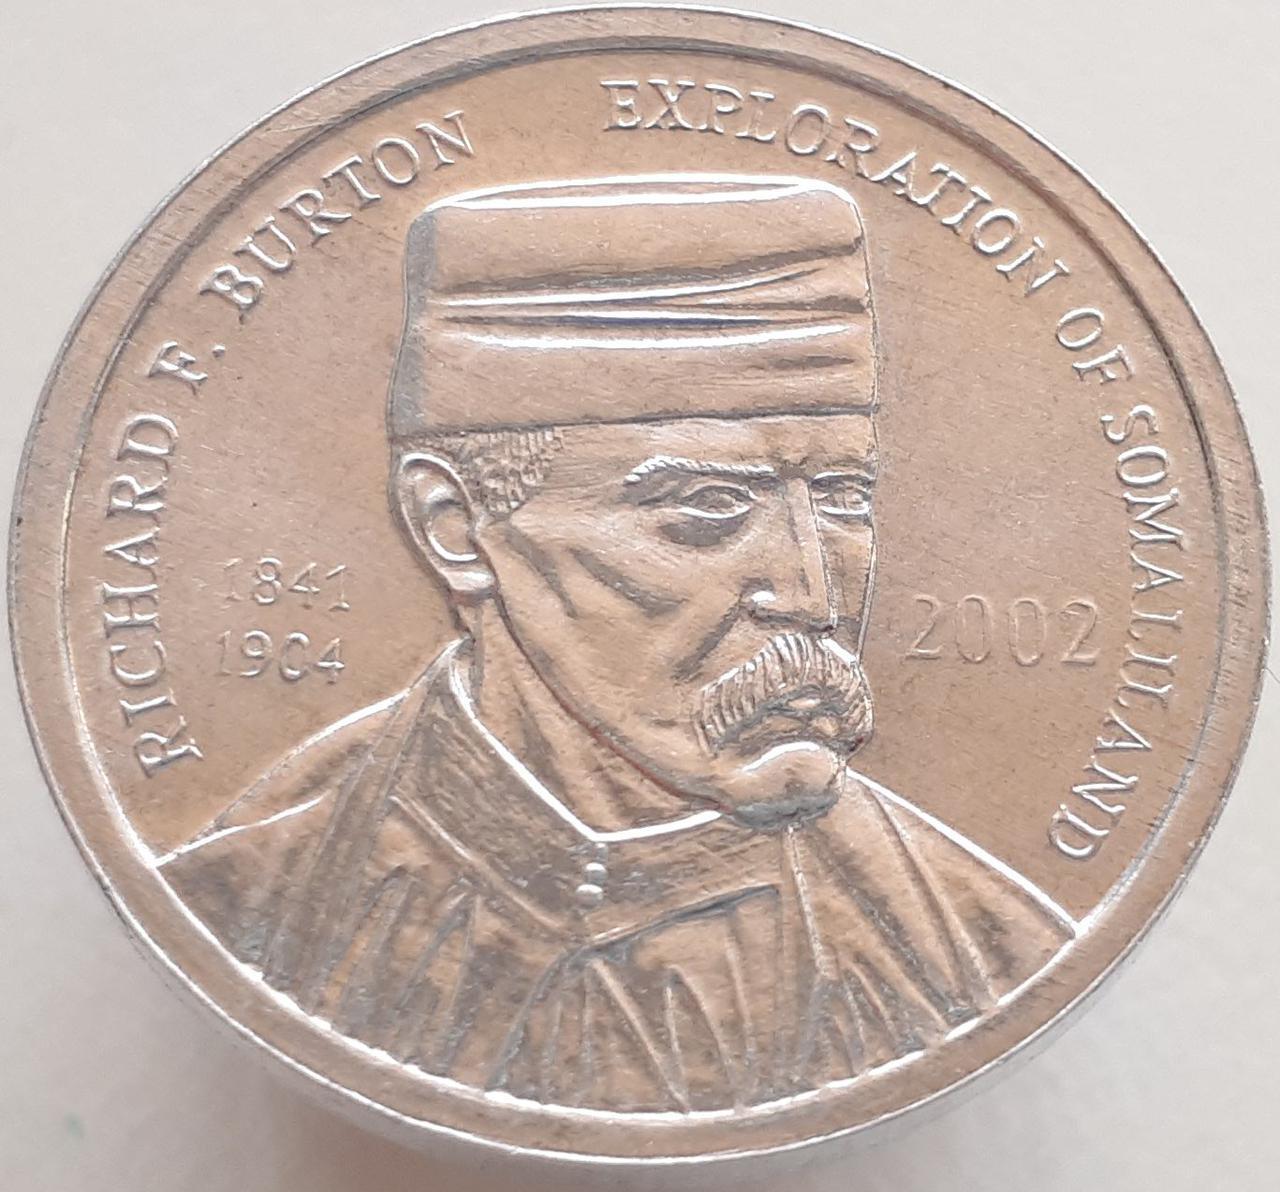 Сомаліленд 5 шилінгів 2002 - Річард Френсіс Бертон